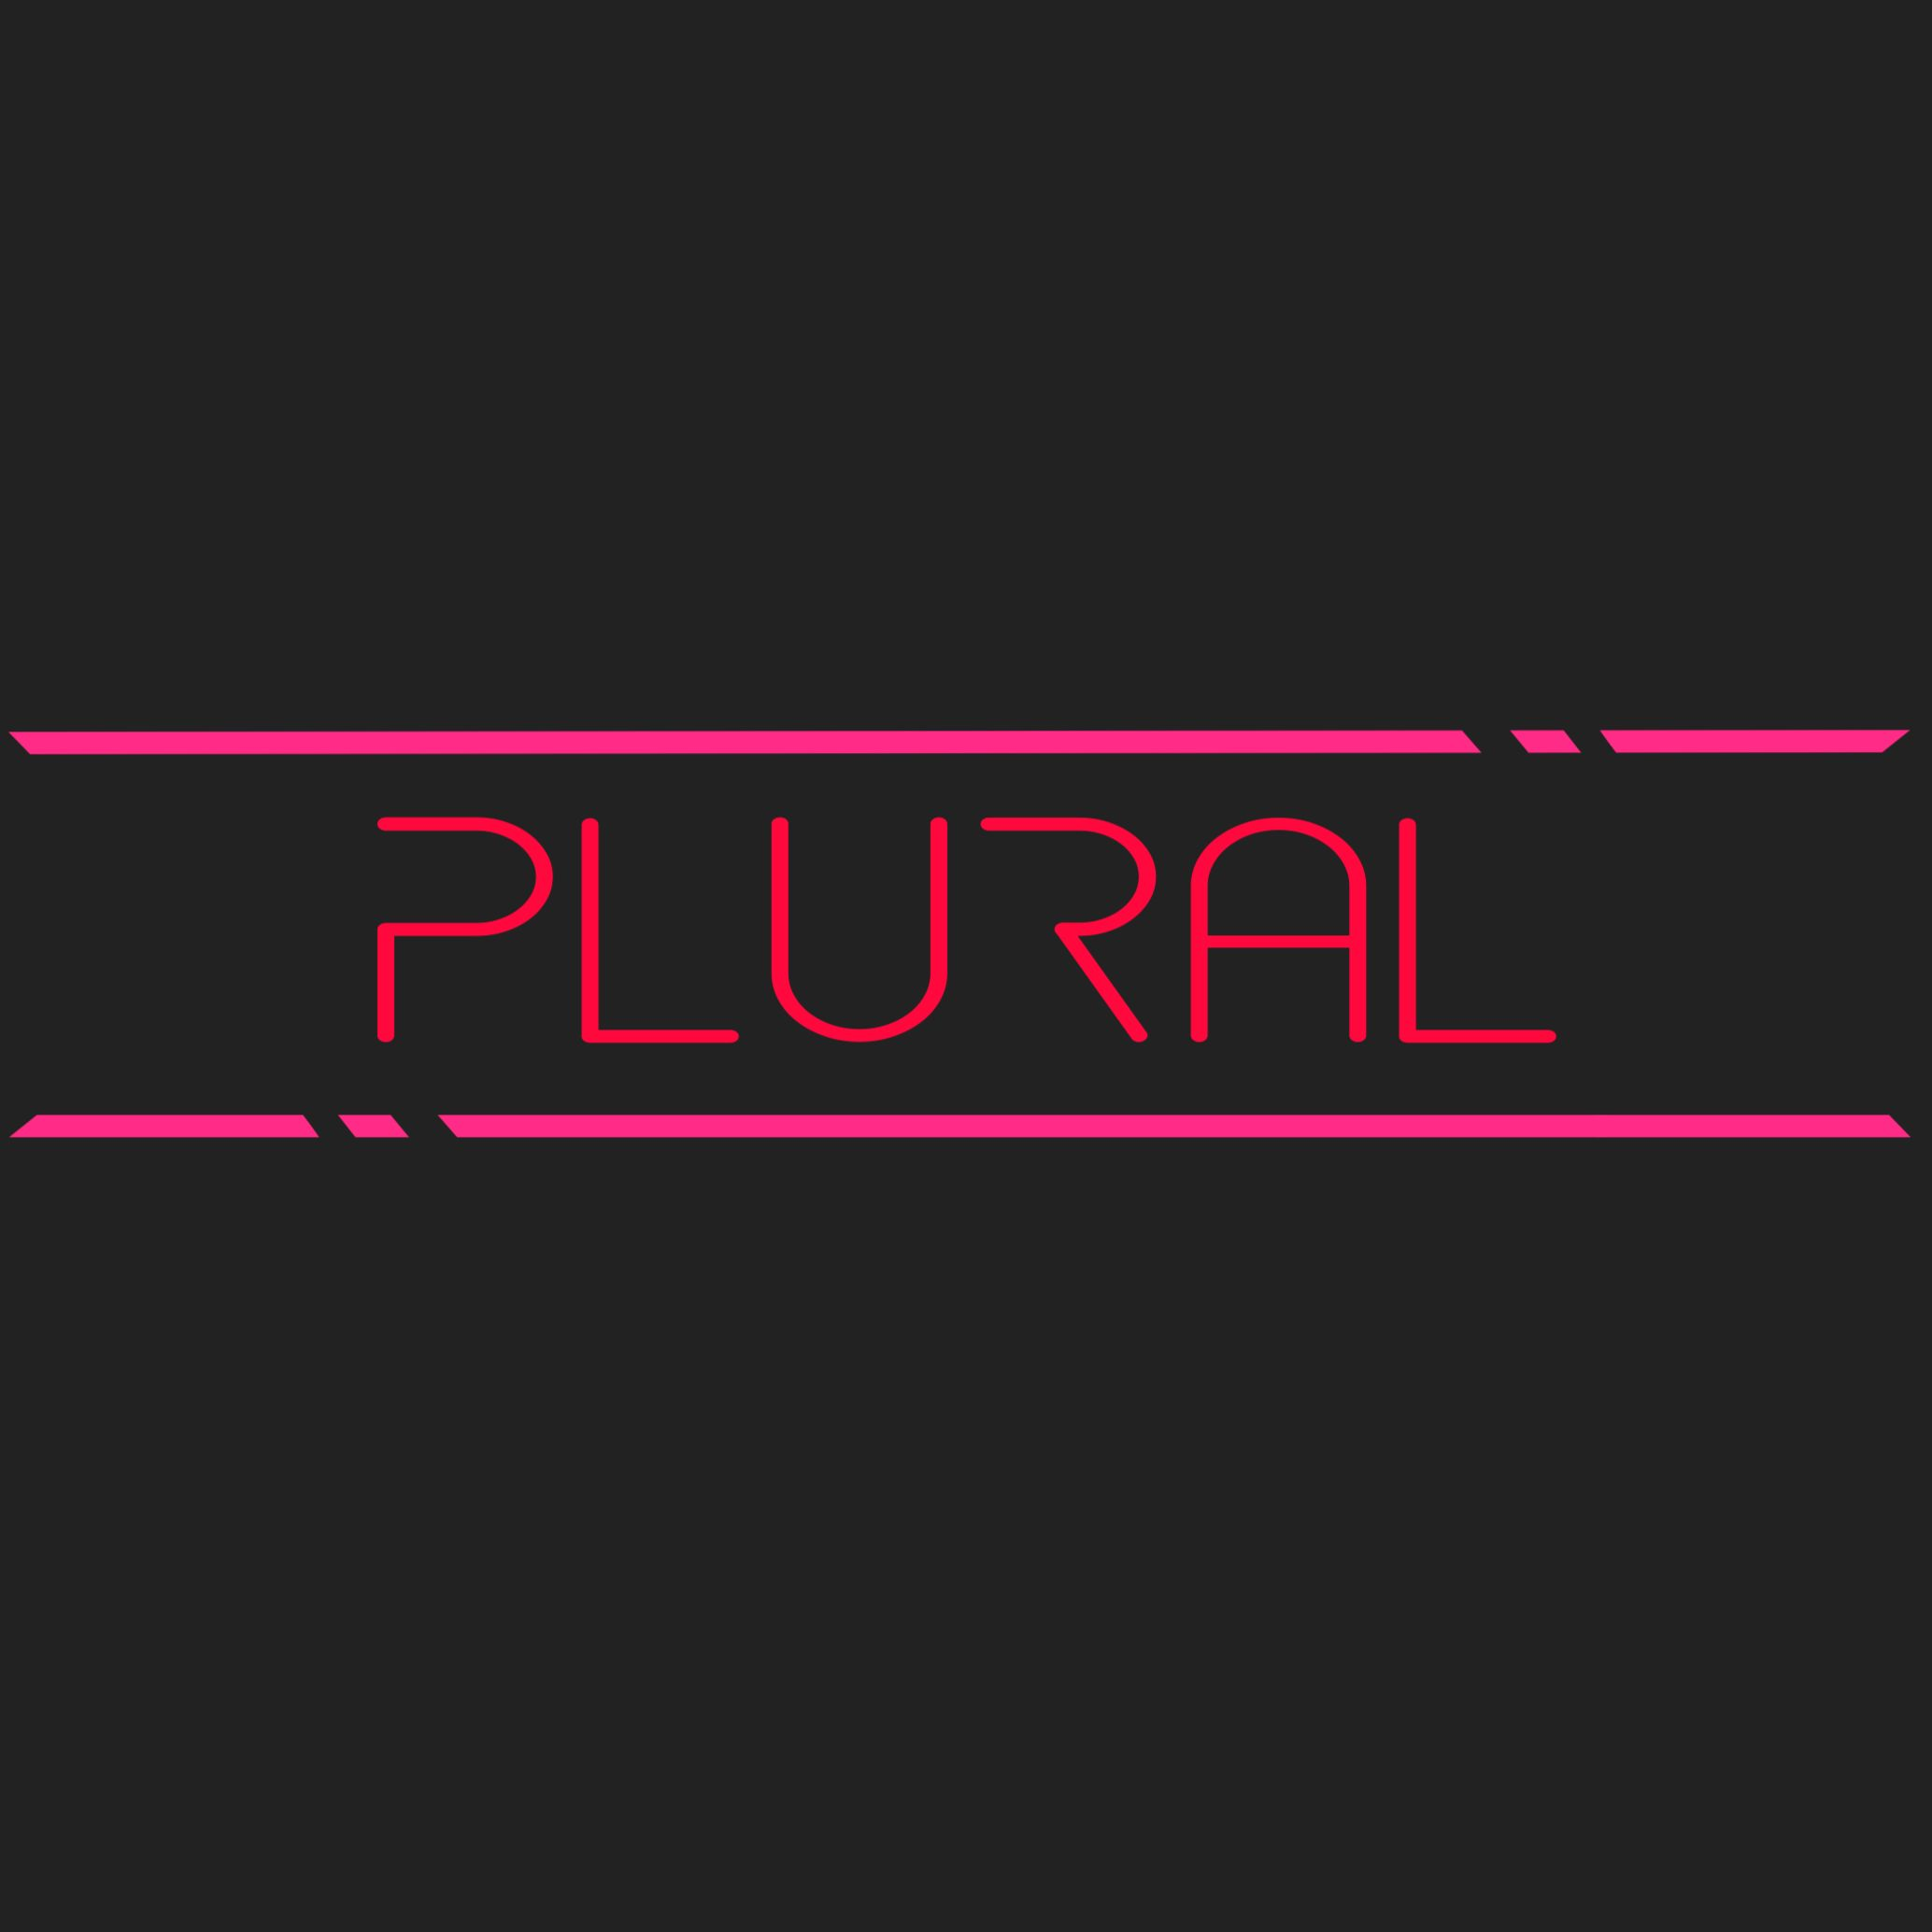 Plural e Singular